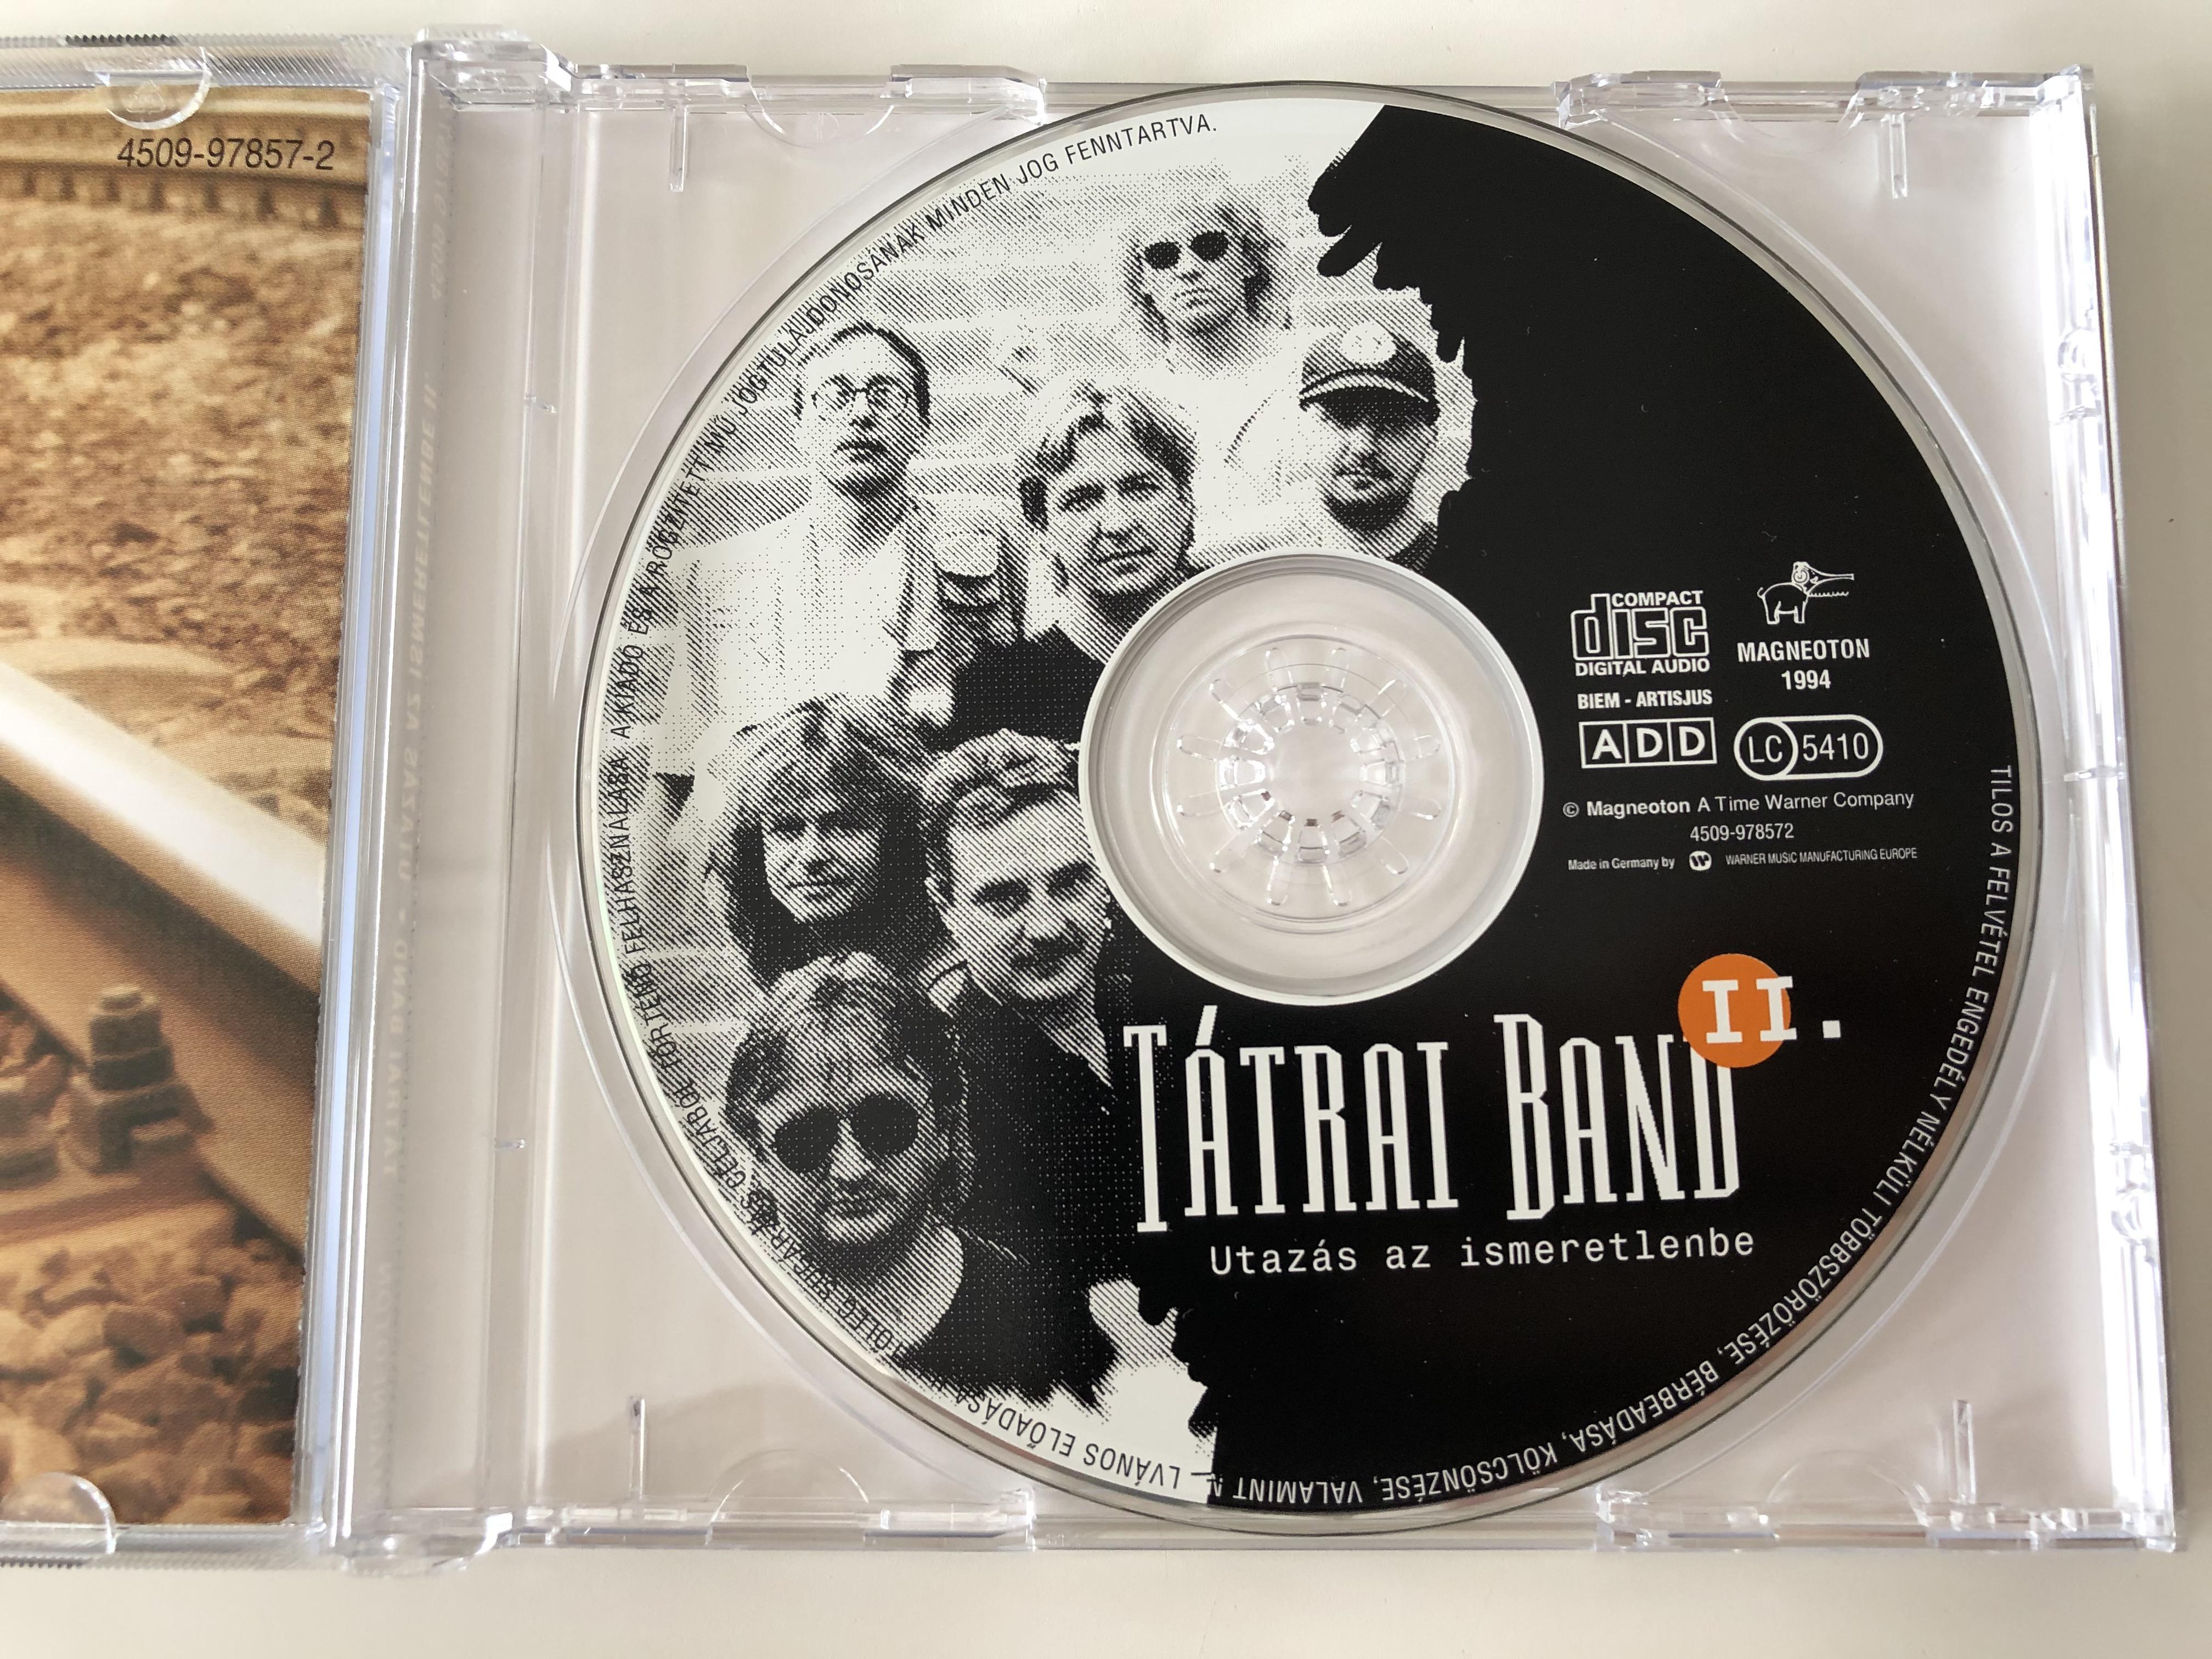 t-trai-band-utaz-s-az-ismeretlenbe...-ii.-magneoton-audio-cd-1994-4509-978572-4-.jpg